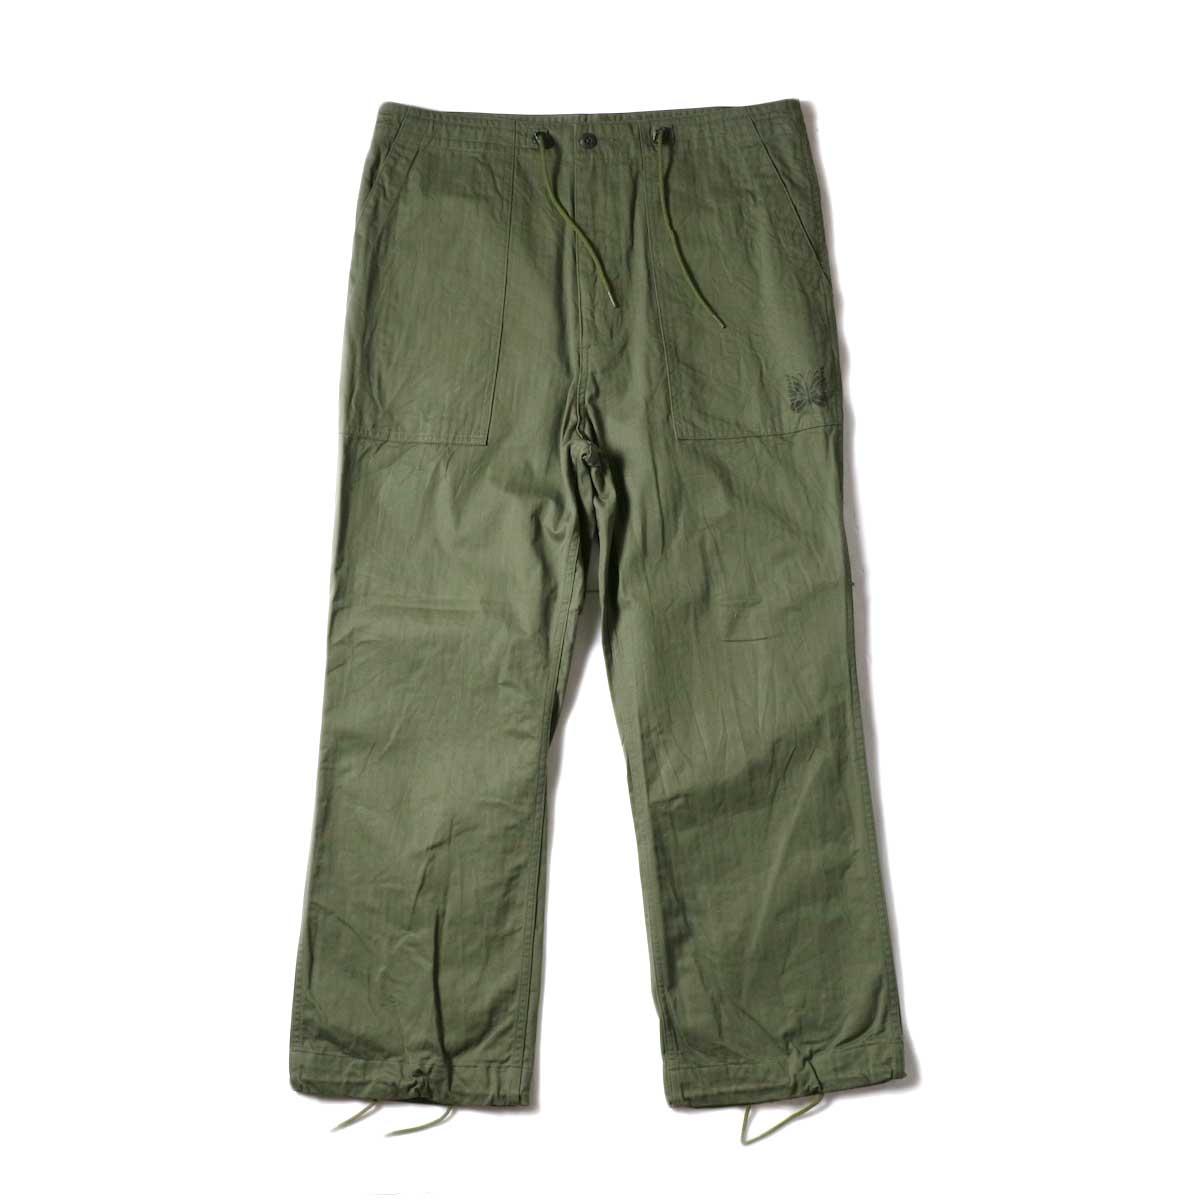 Needles / String Fatigue Pant - Cotton Herringbone (Olive)